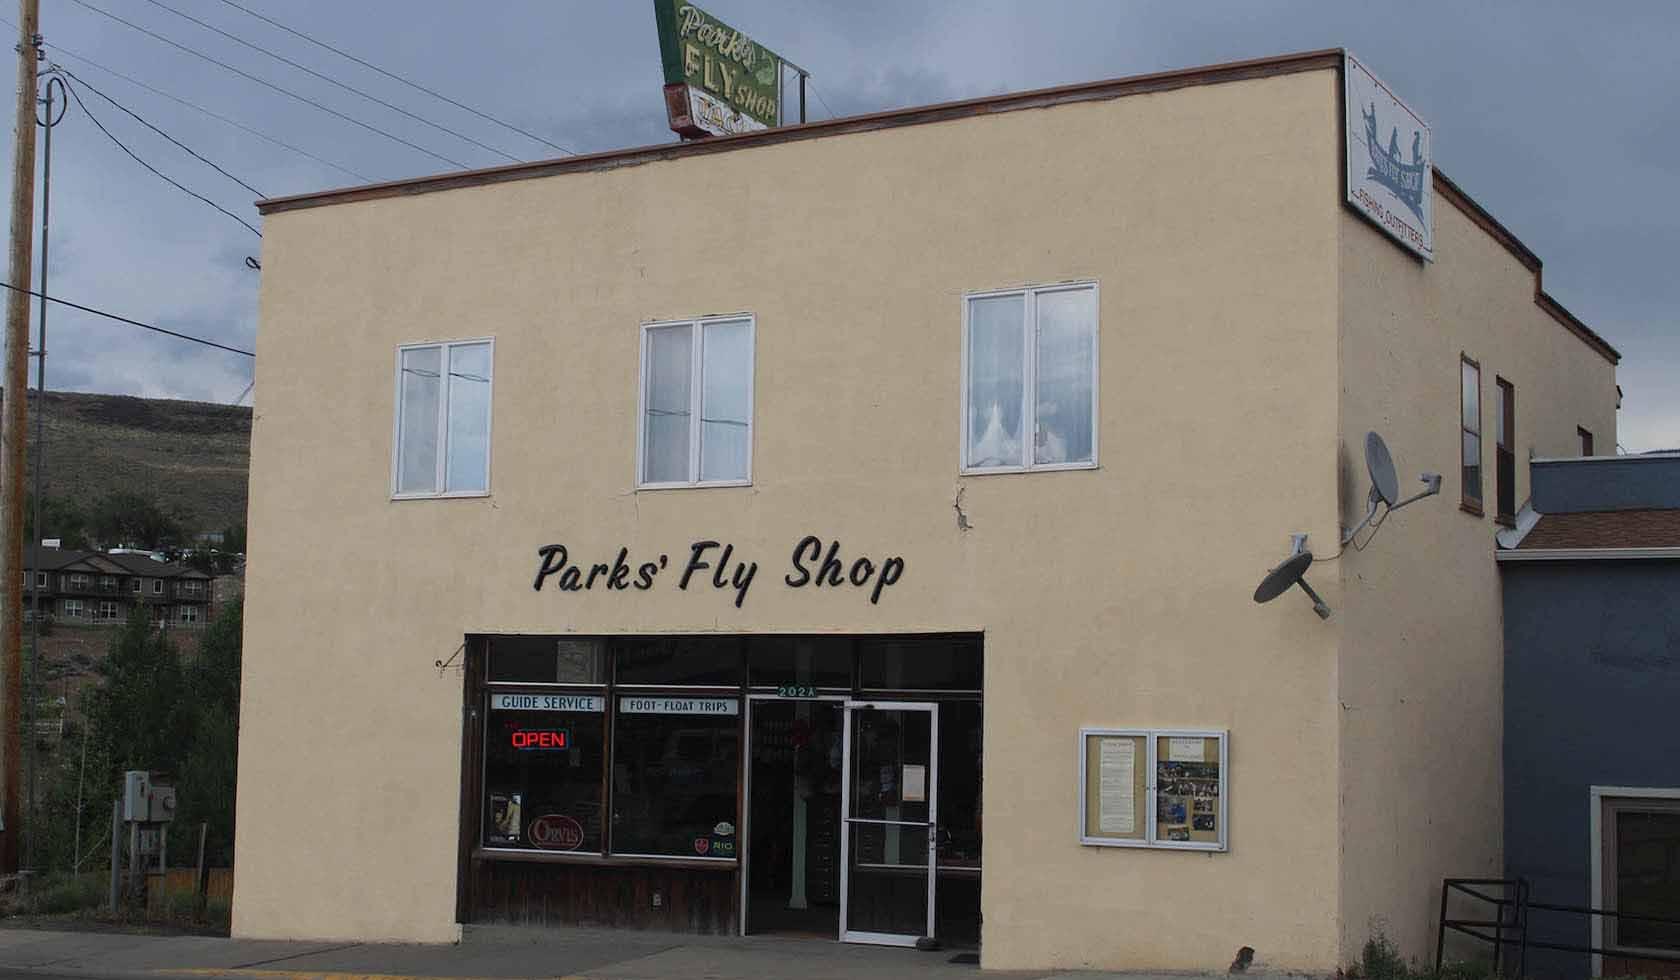 Parks' Fly Shop profile image